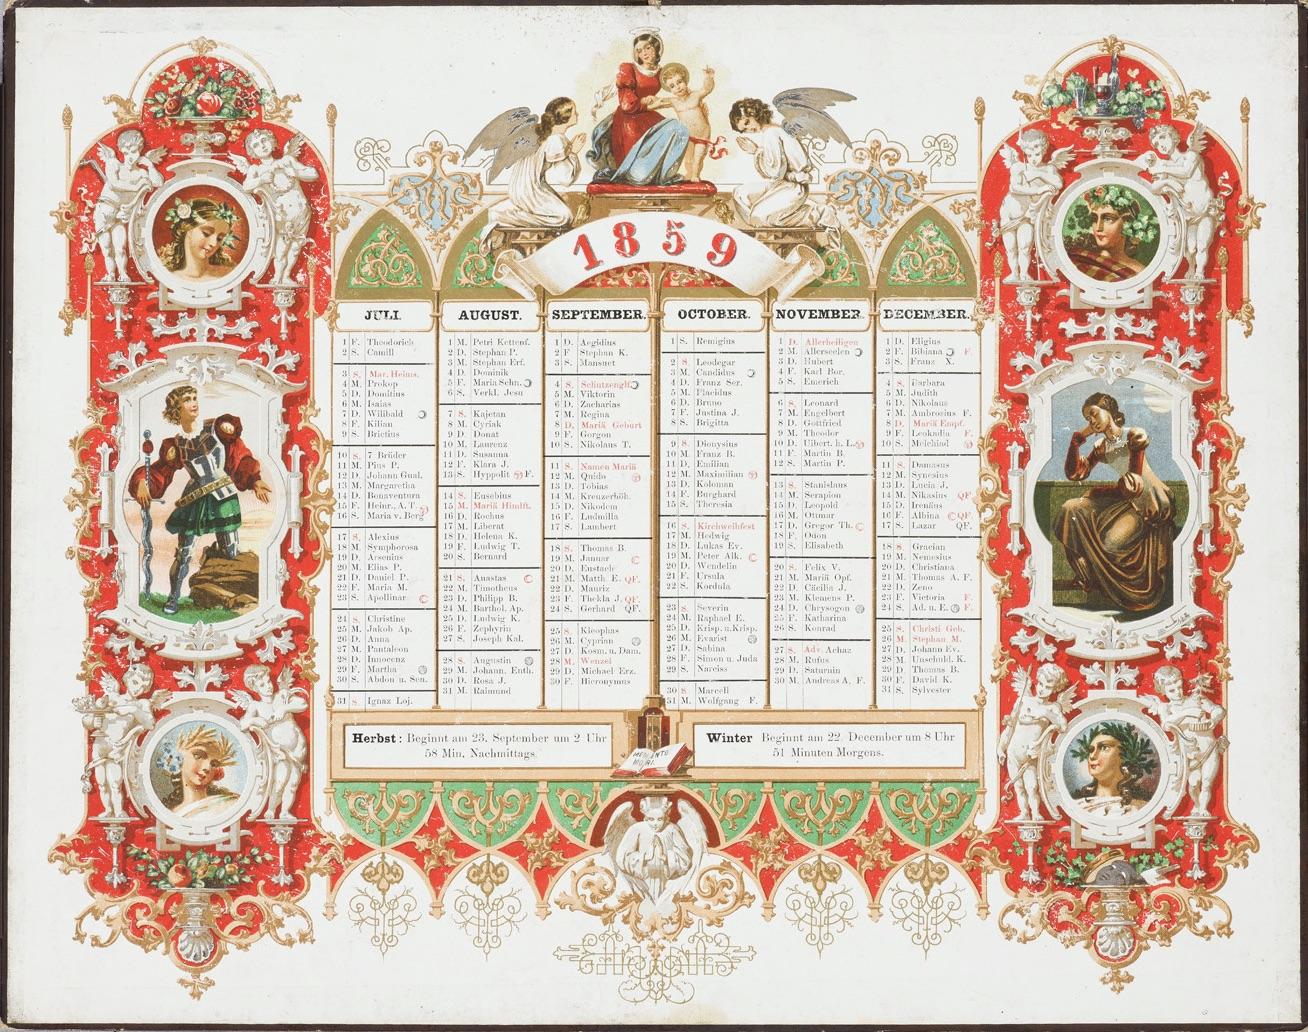 Bohatě zdobený kalendář na rok 1859 s postavami v historických kostýmech a ženskými hlavami s věnci